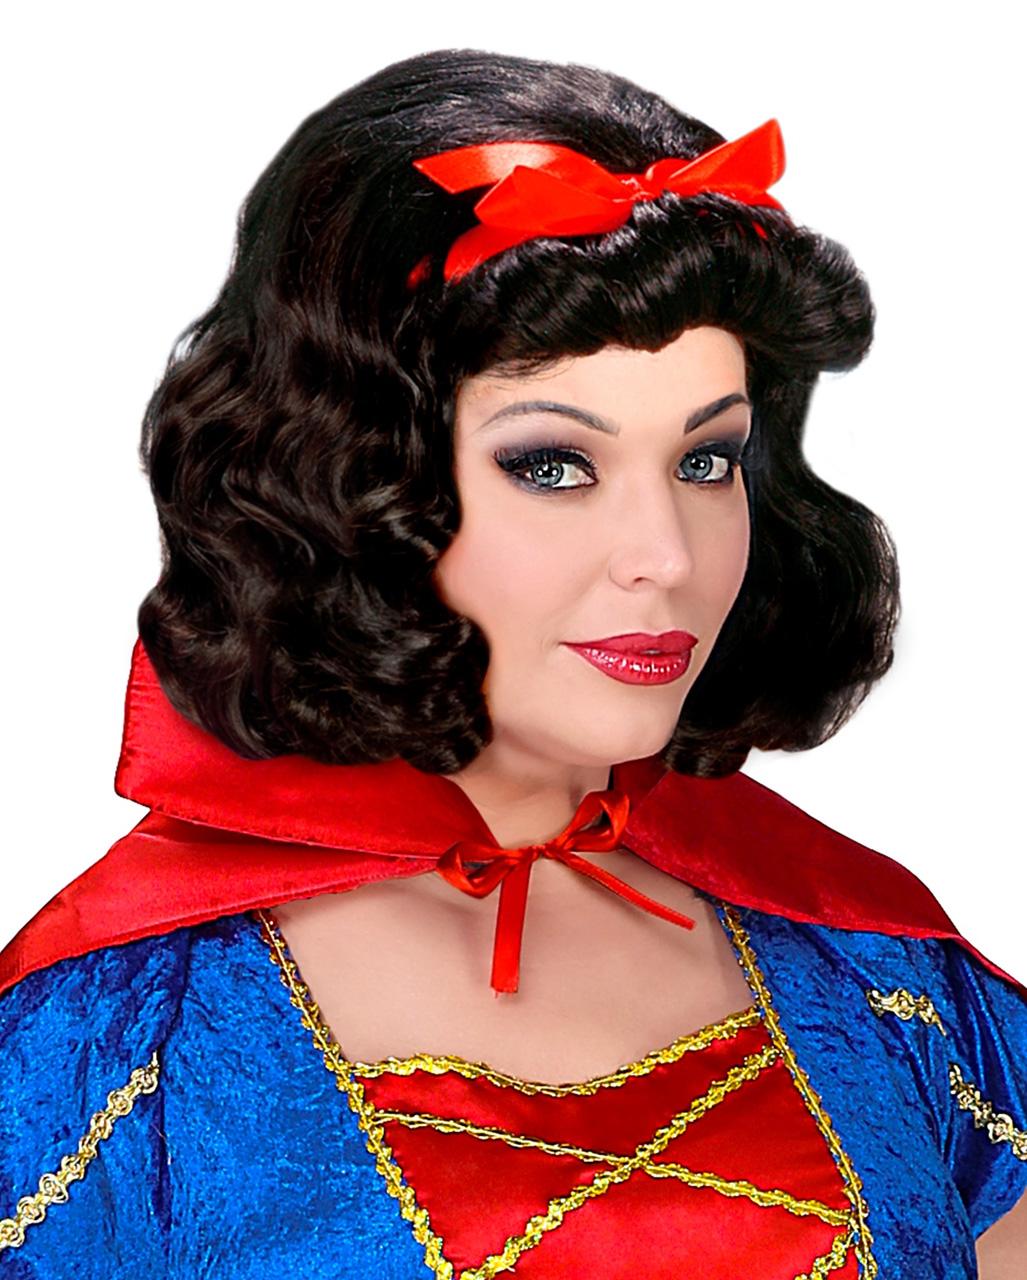 Women Wavy Hair Princess Snow White Cosplay Halloween Costume Wig pretty